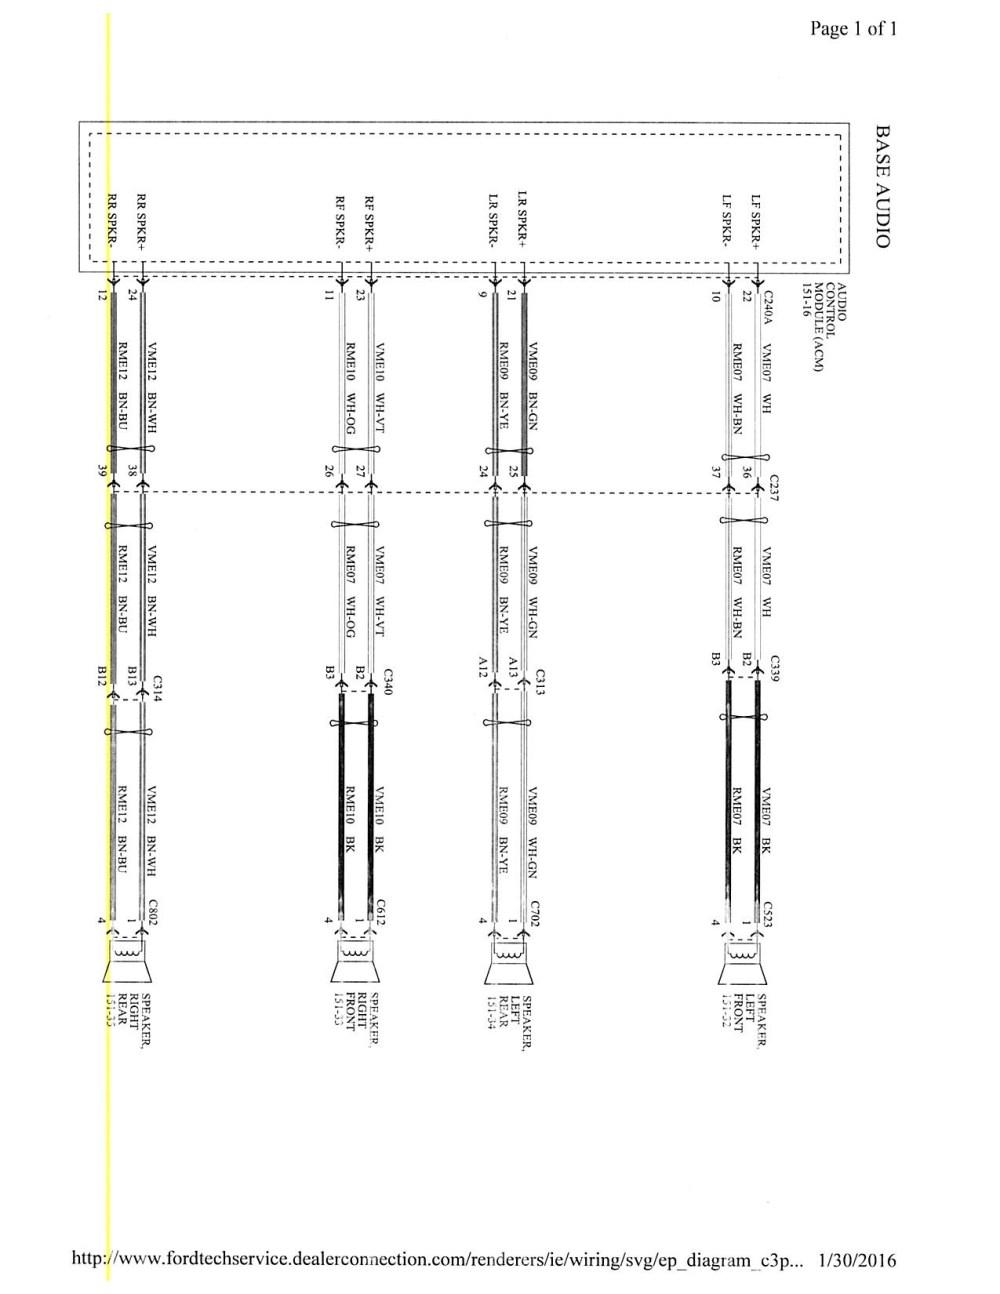 medium resolution of 2015 focus mk3 5 stereo wiring diagram wiringdiagrambase jpg